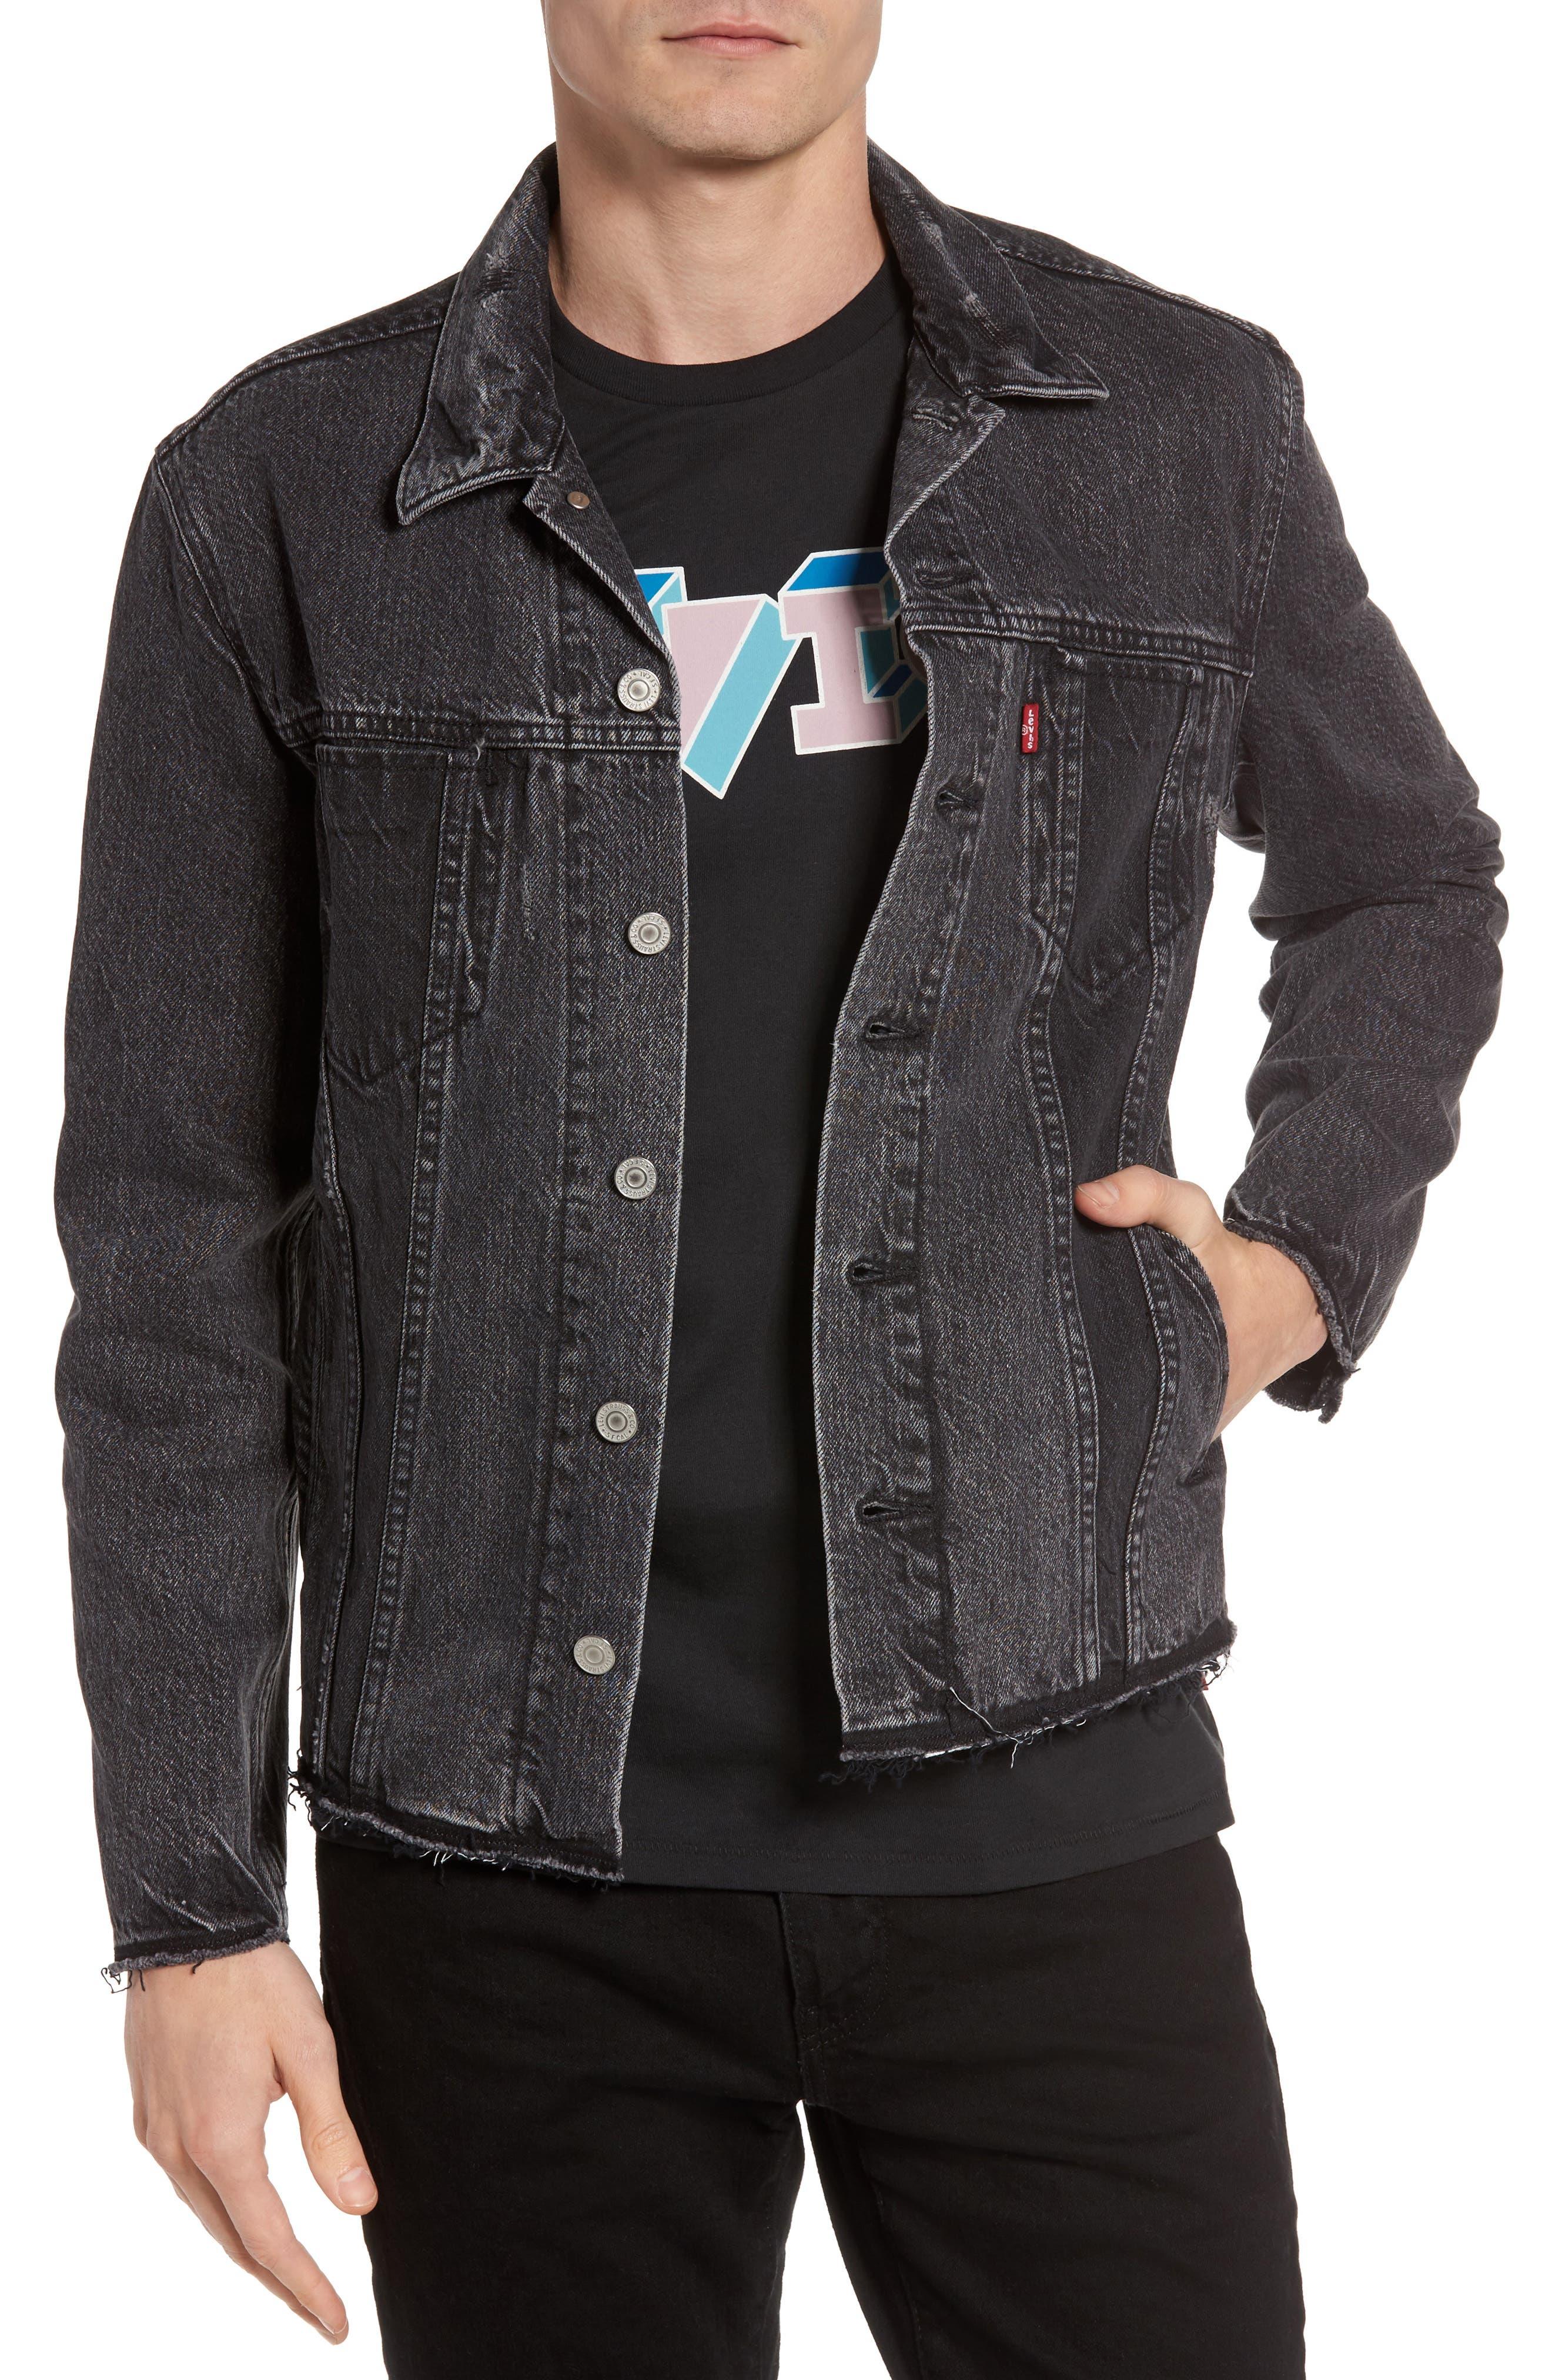 Main Image - Levi's® Altered Distressed Denim Trucker Jacket